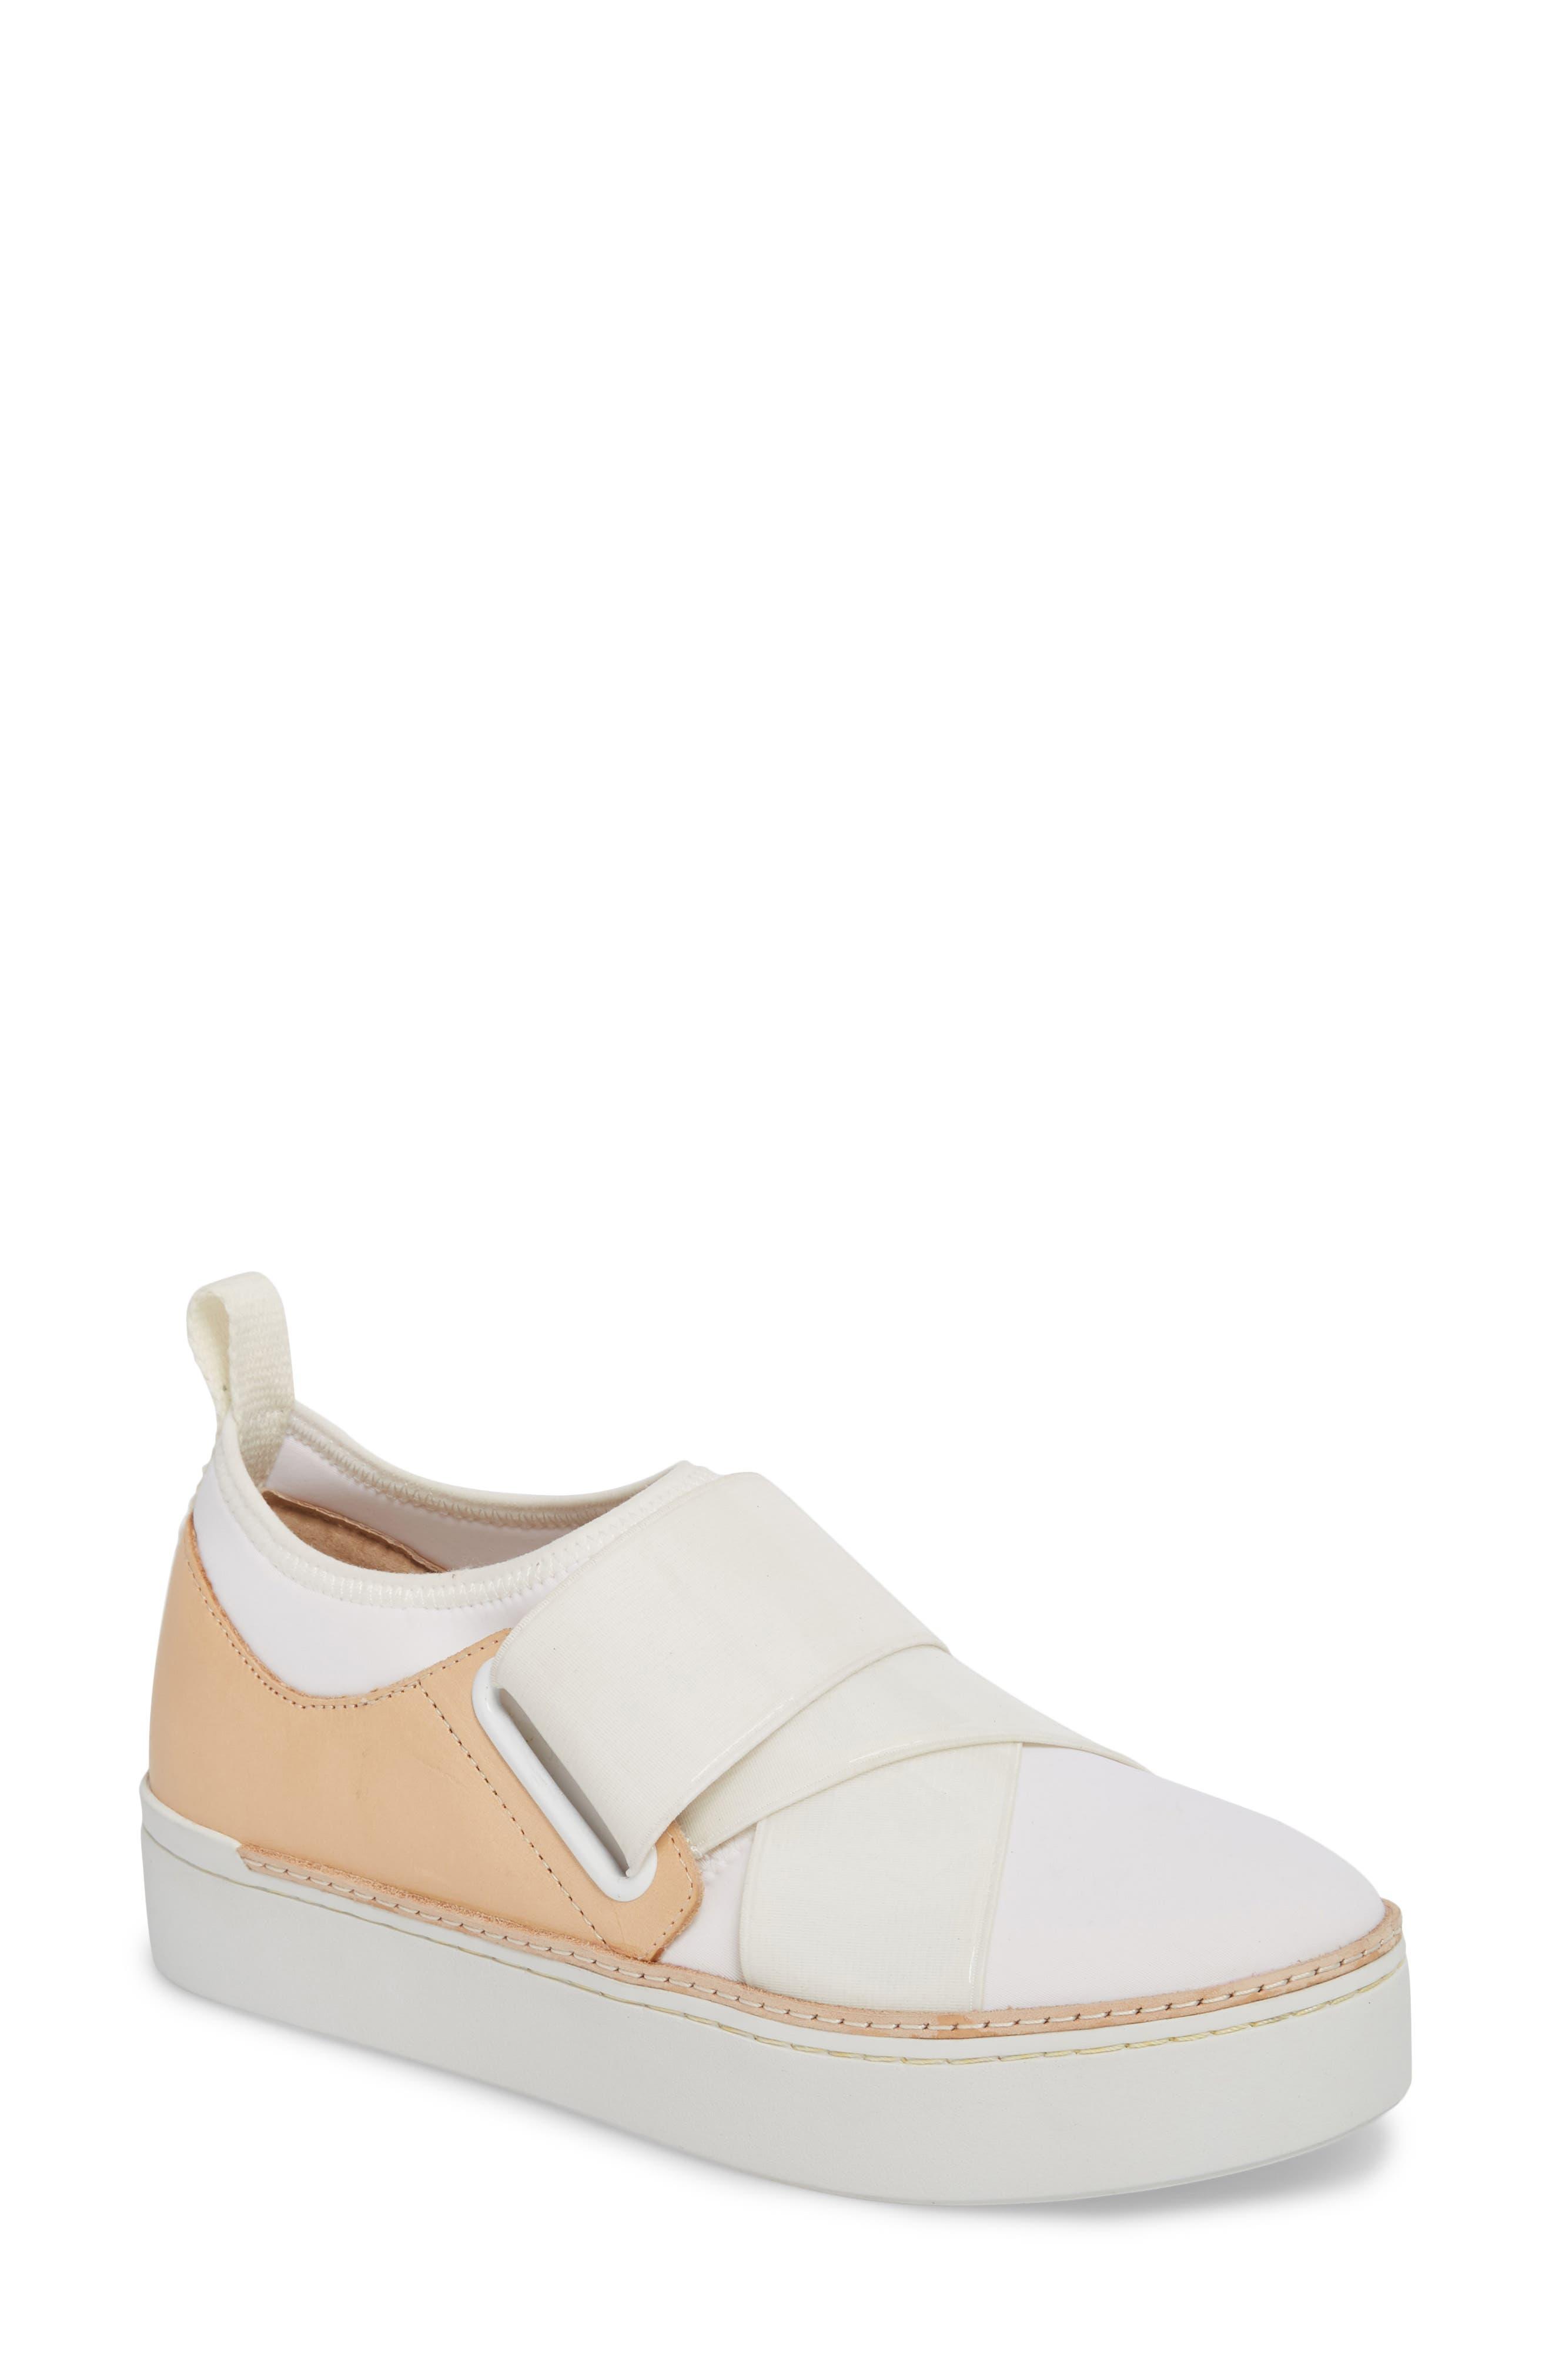 M4D3 FOOTWEAR Women's M4D3 Shannon Platform Sneaker xnfQzv